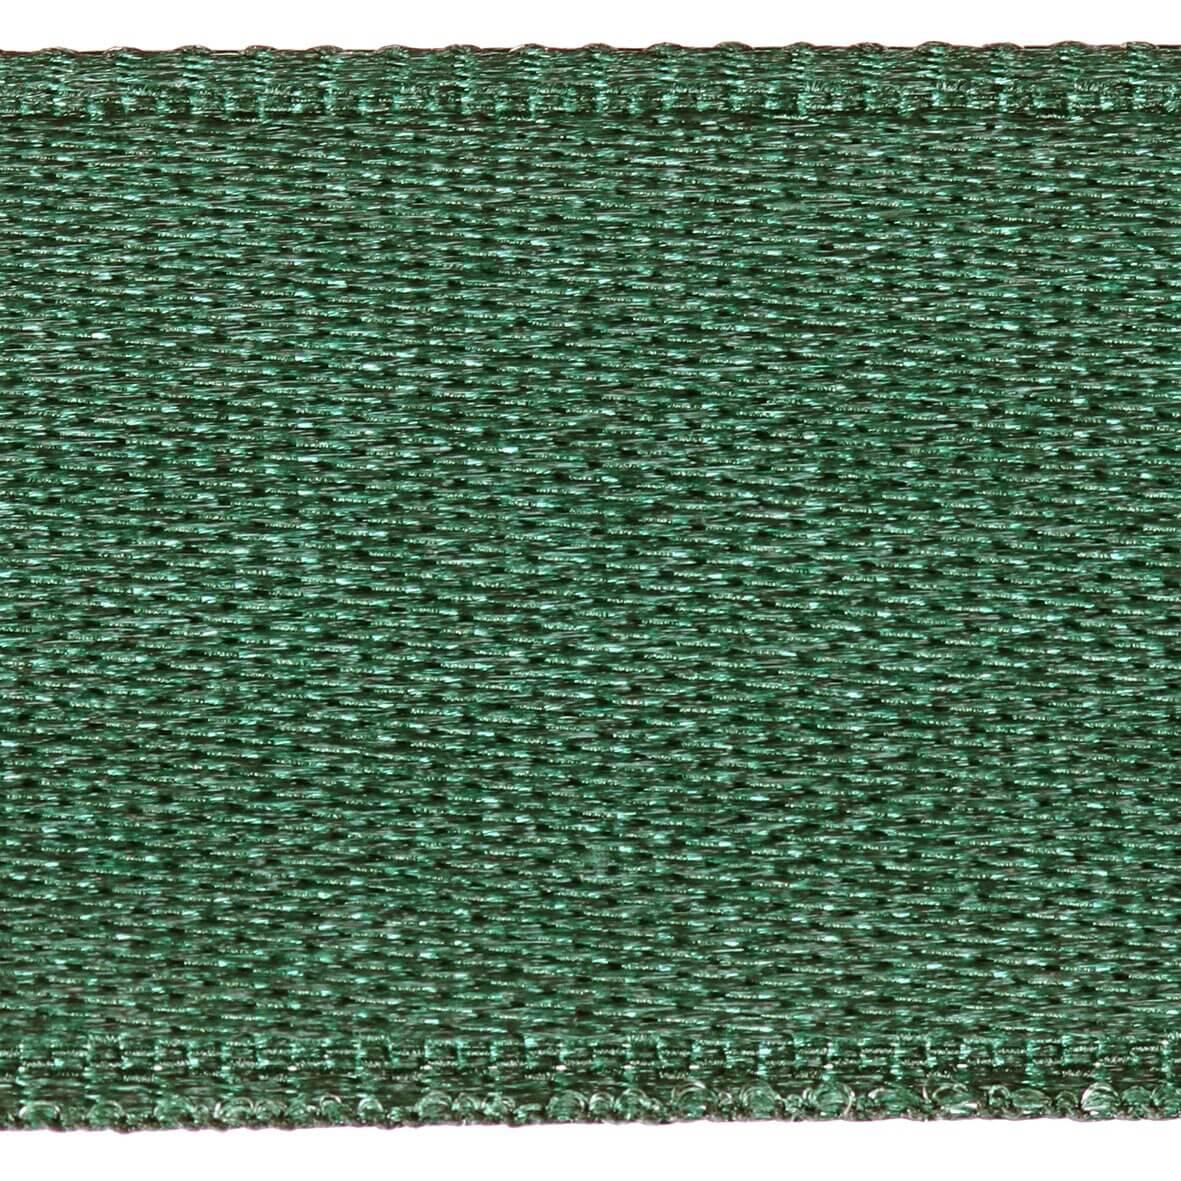 Forest Green Col. 534 - 3mm Satab Satin Ribbon